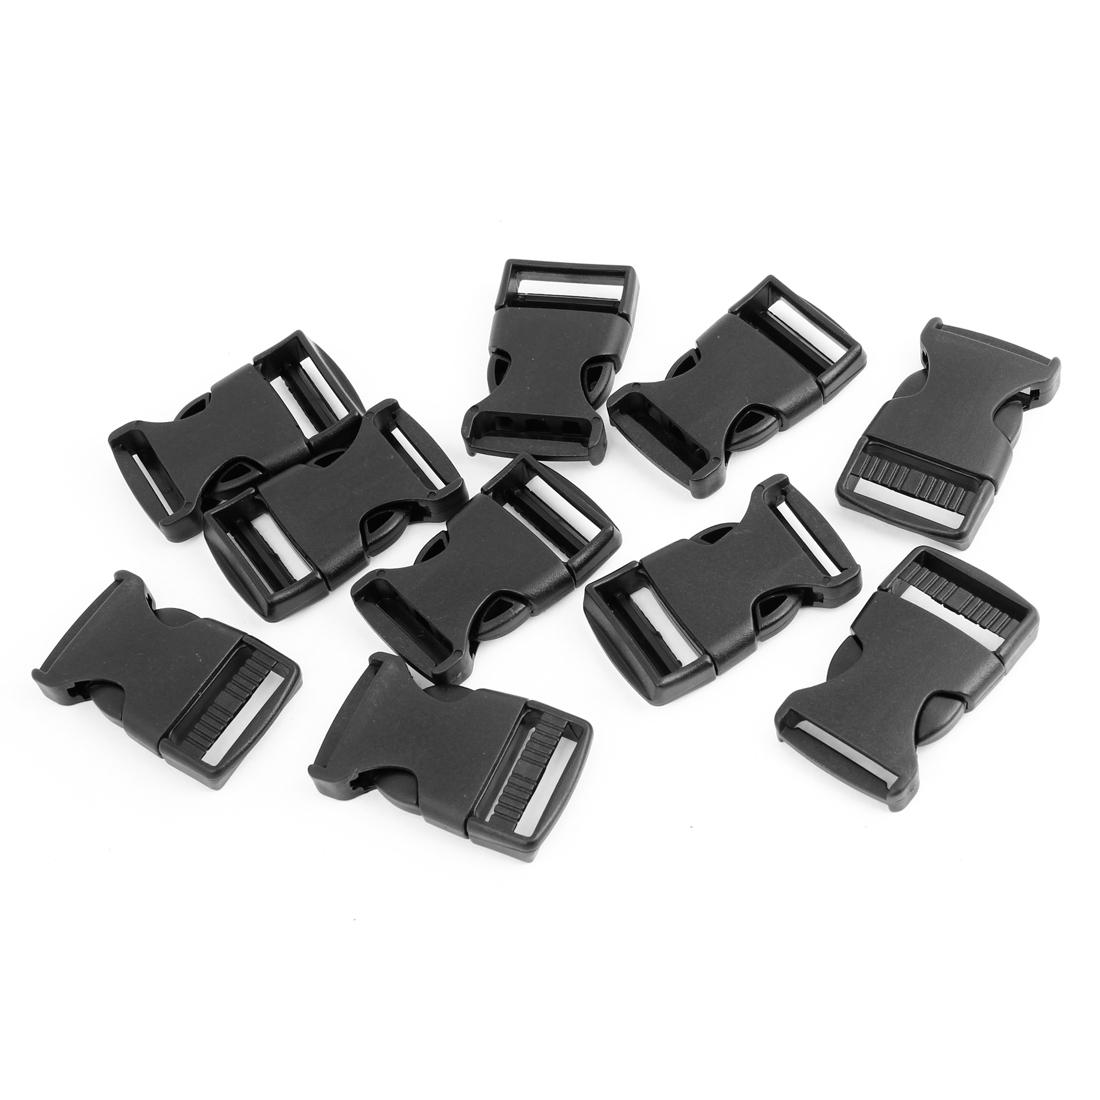 "10 Pcs 1"" 2.5CM Width Plastic Safety Quick Release Buckles Black"